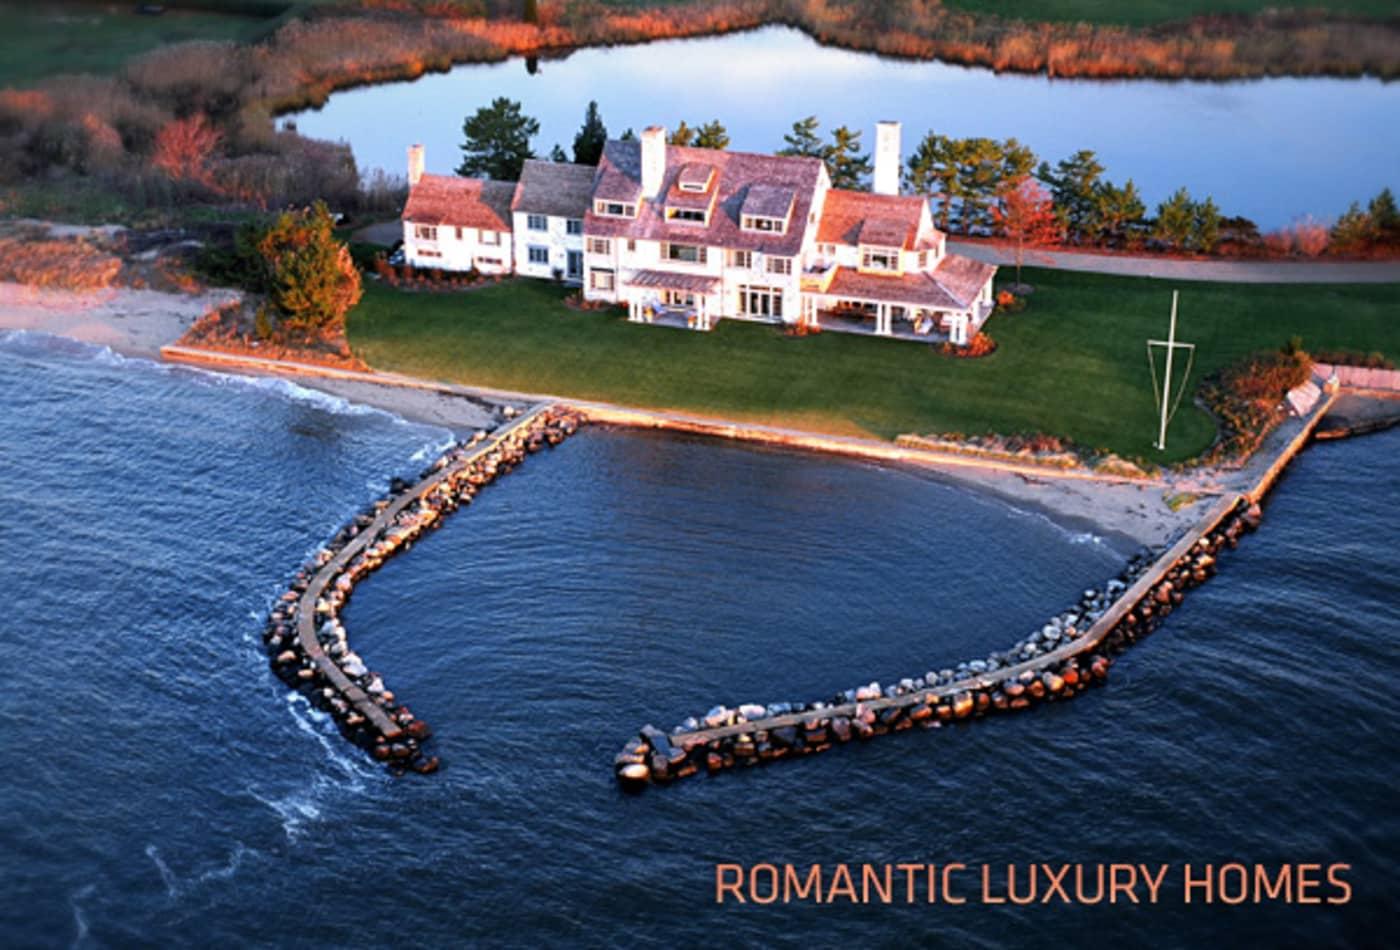 Katharine-Hepburn-Romantic-Luxury-Homes-Cover.jpg